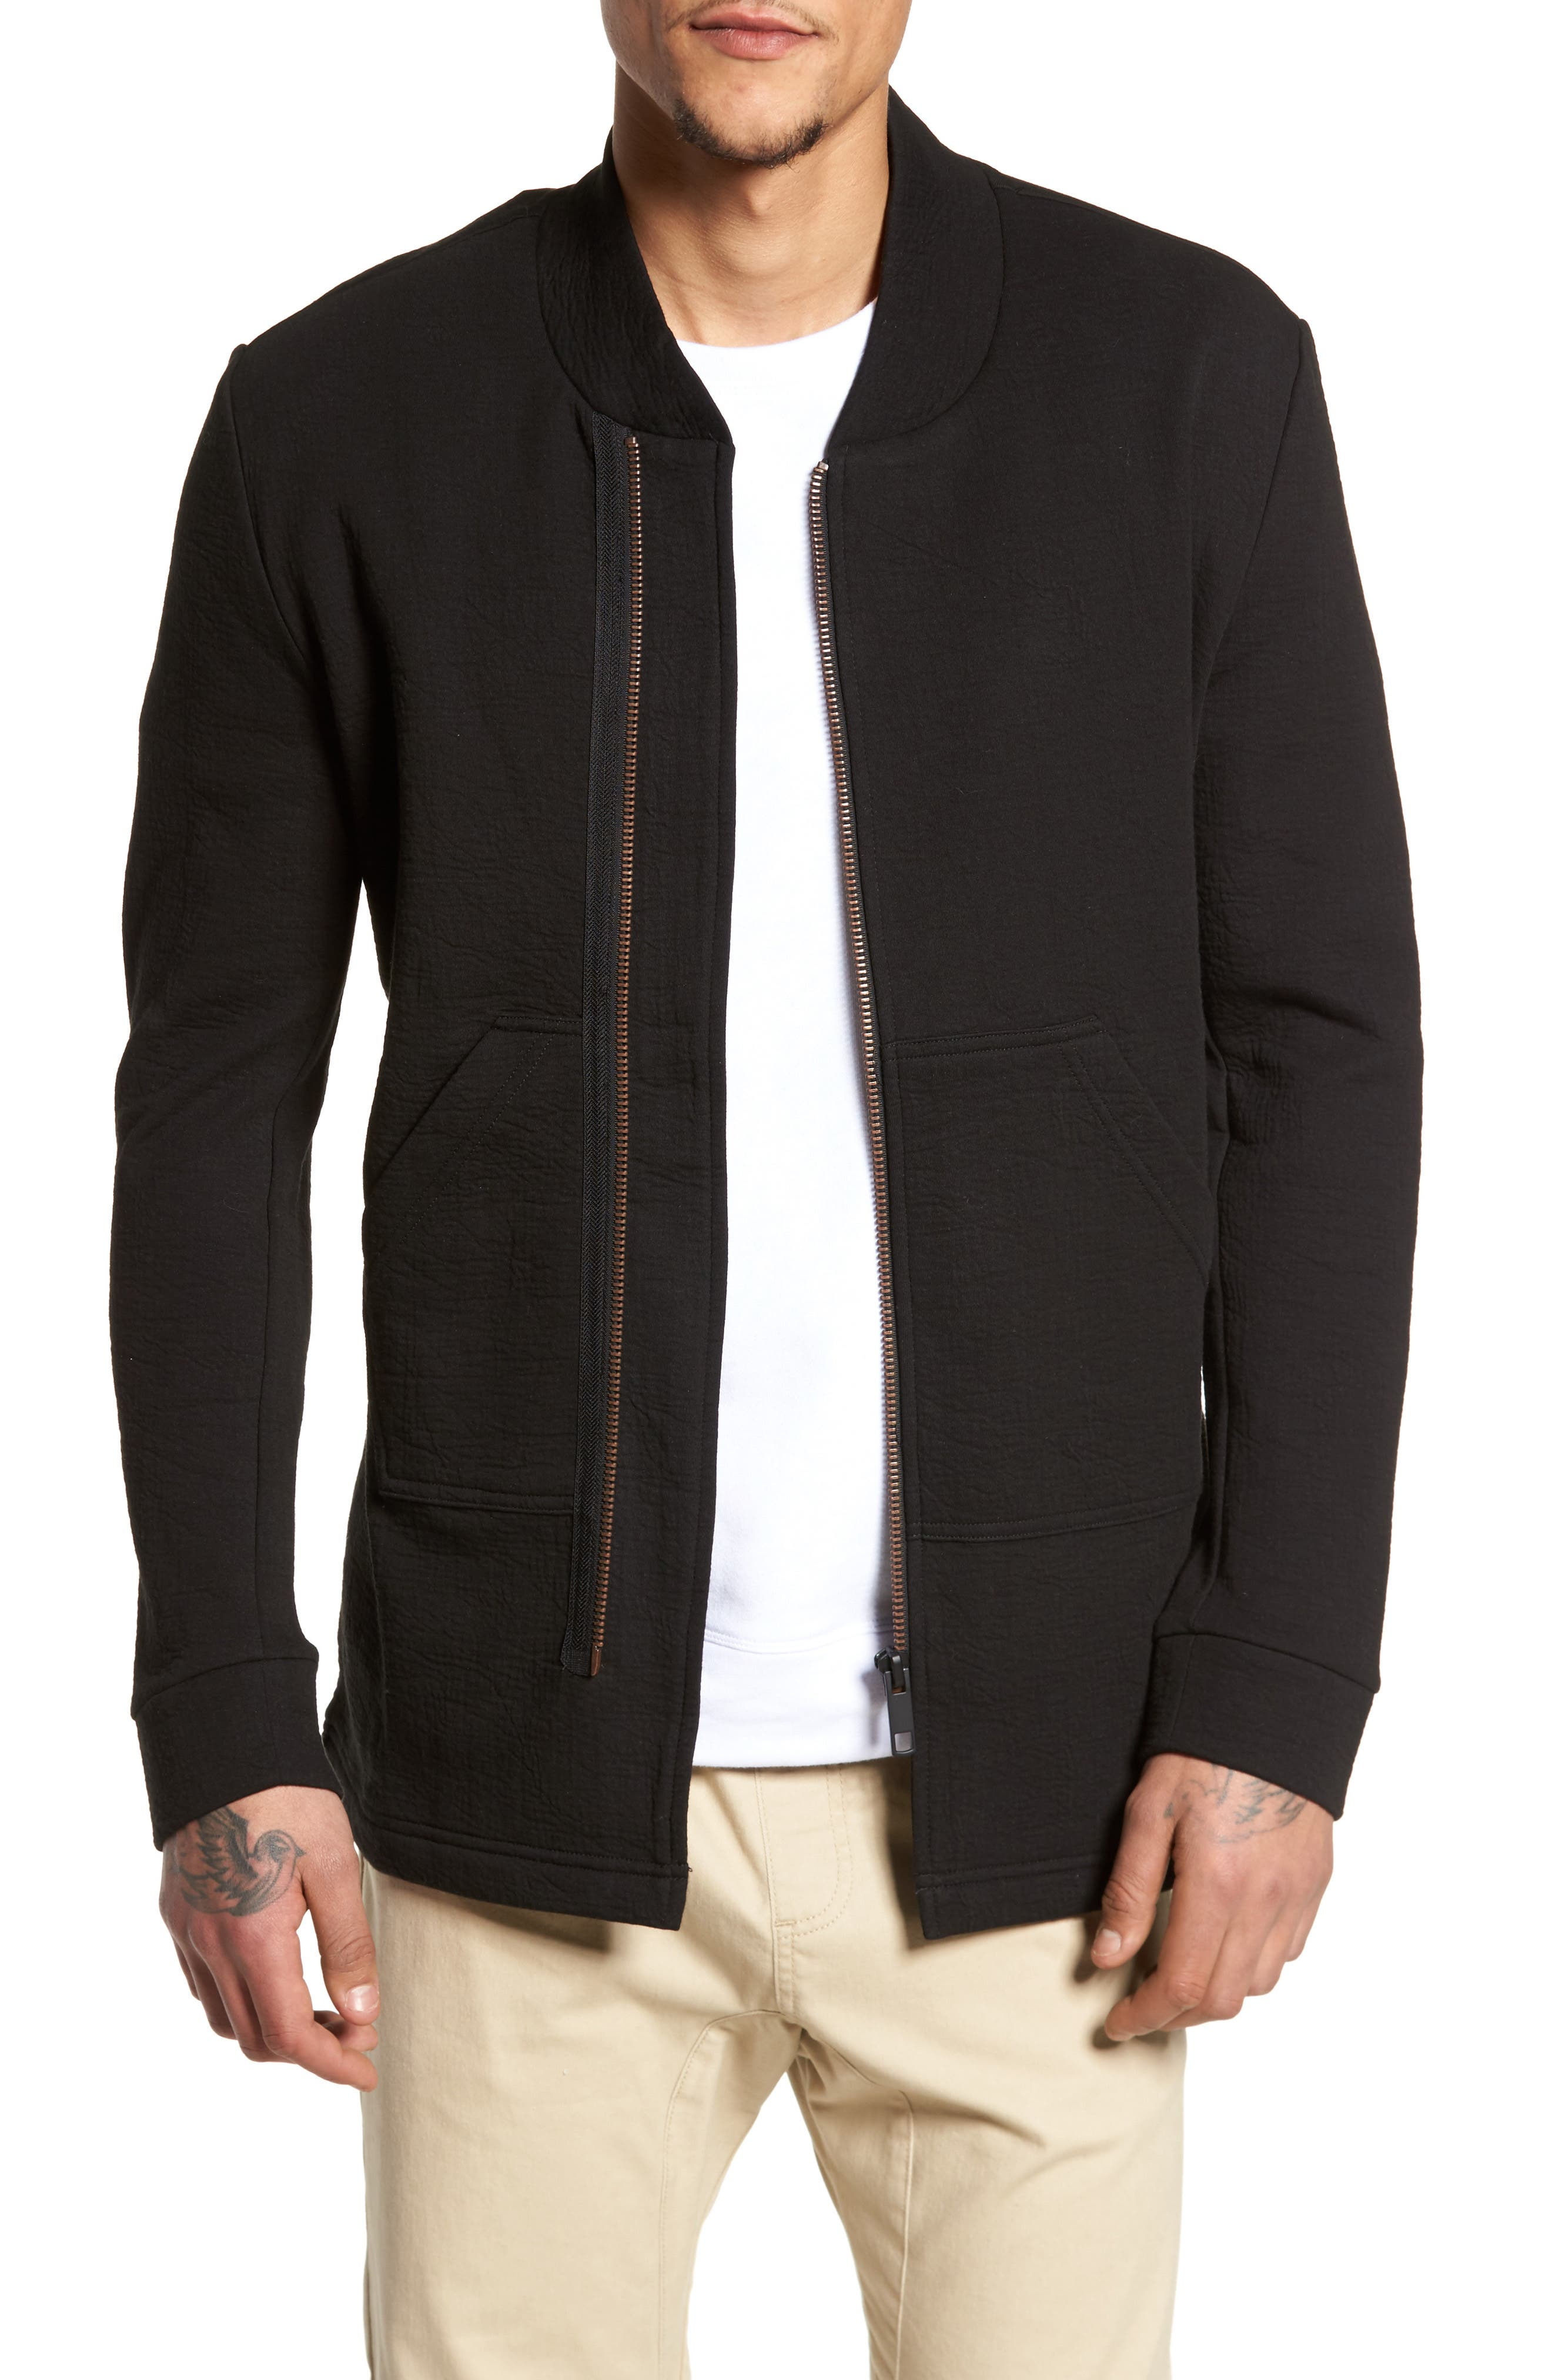 Main Image - Antony Morato Zip Fleece Track Jacket